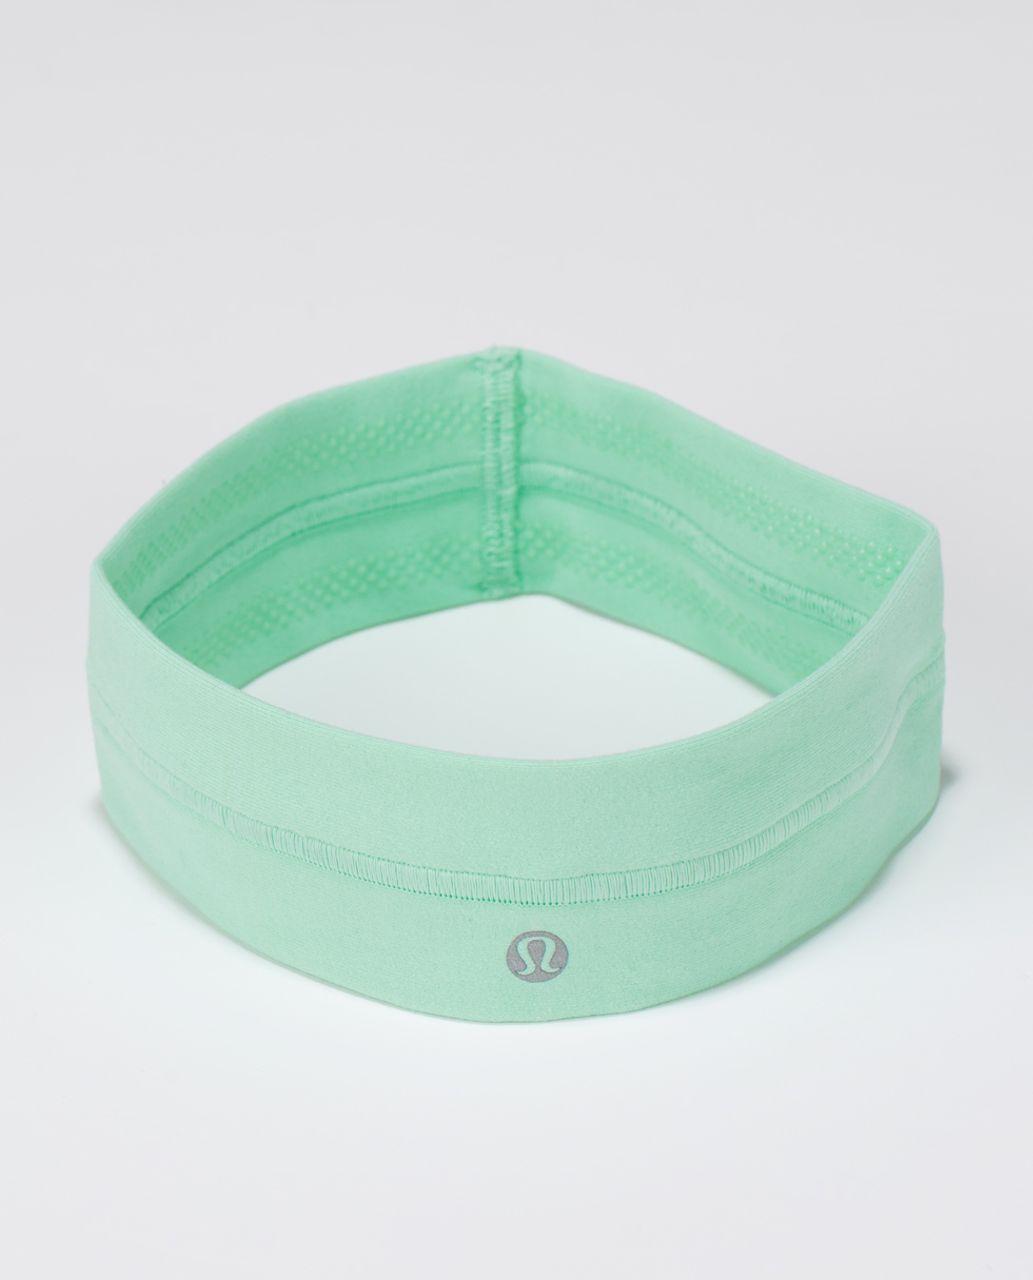 Lululemon Fly Away Tamer Headband - Toothpaste